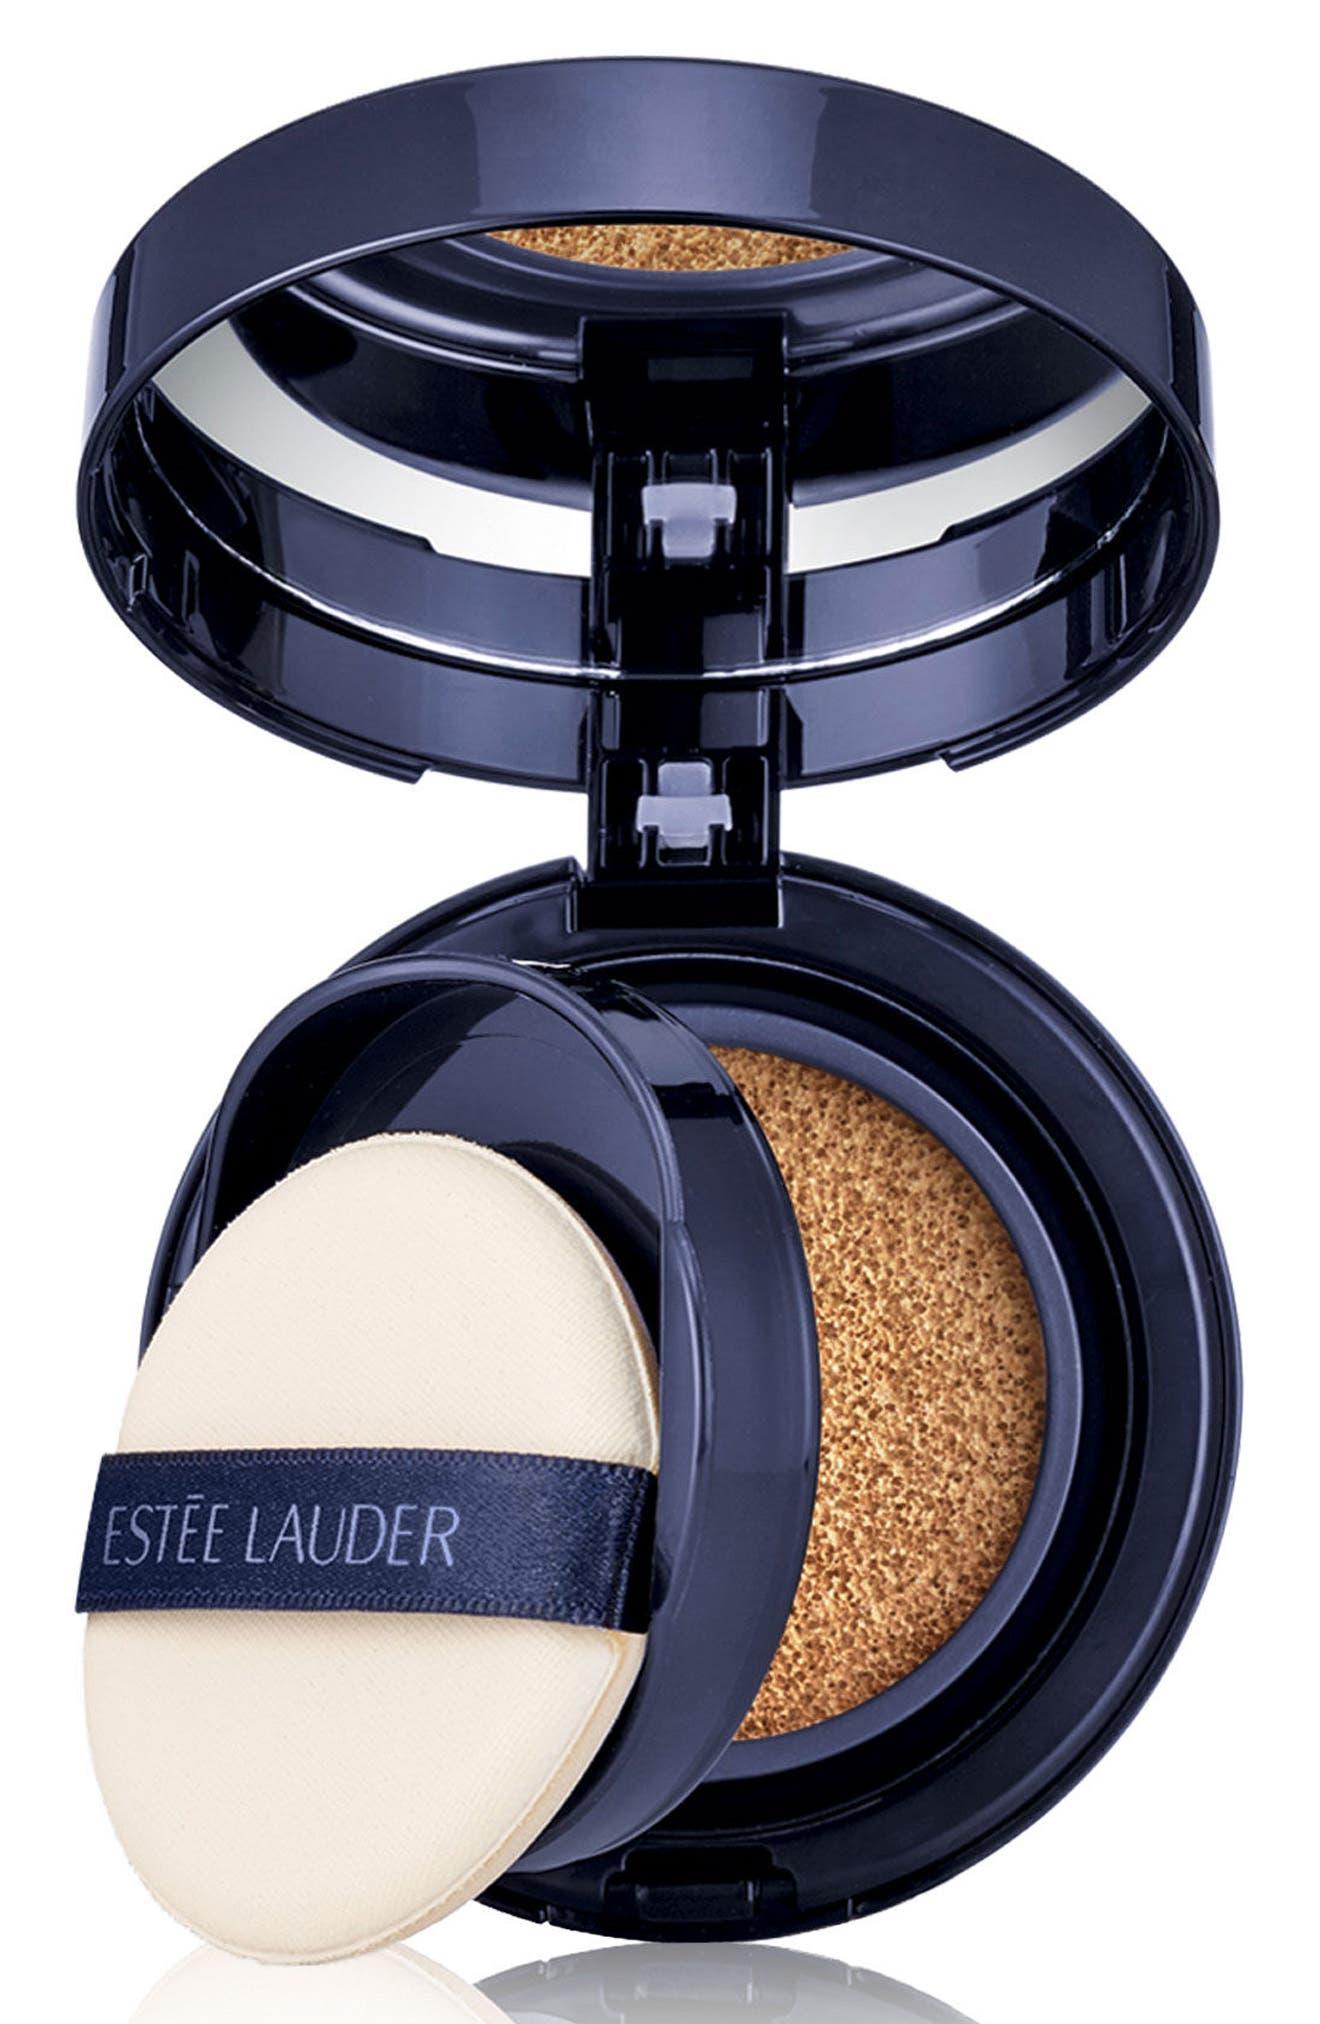 Estee Lauder Double Wear Cushion Bb All Day Wear Liquid Compact Spf 50 -